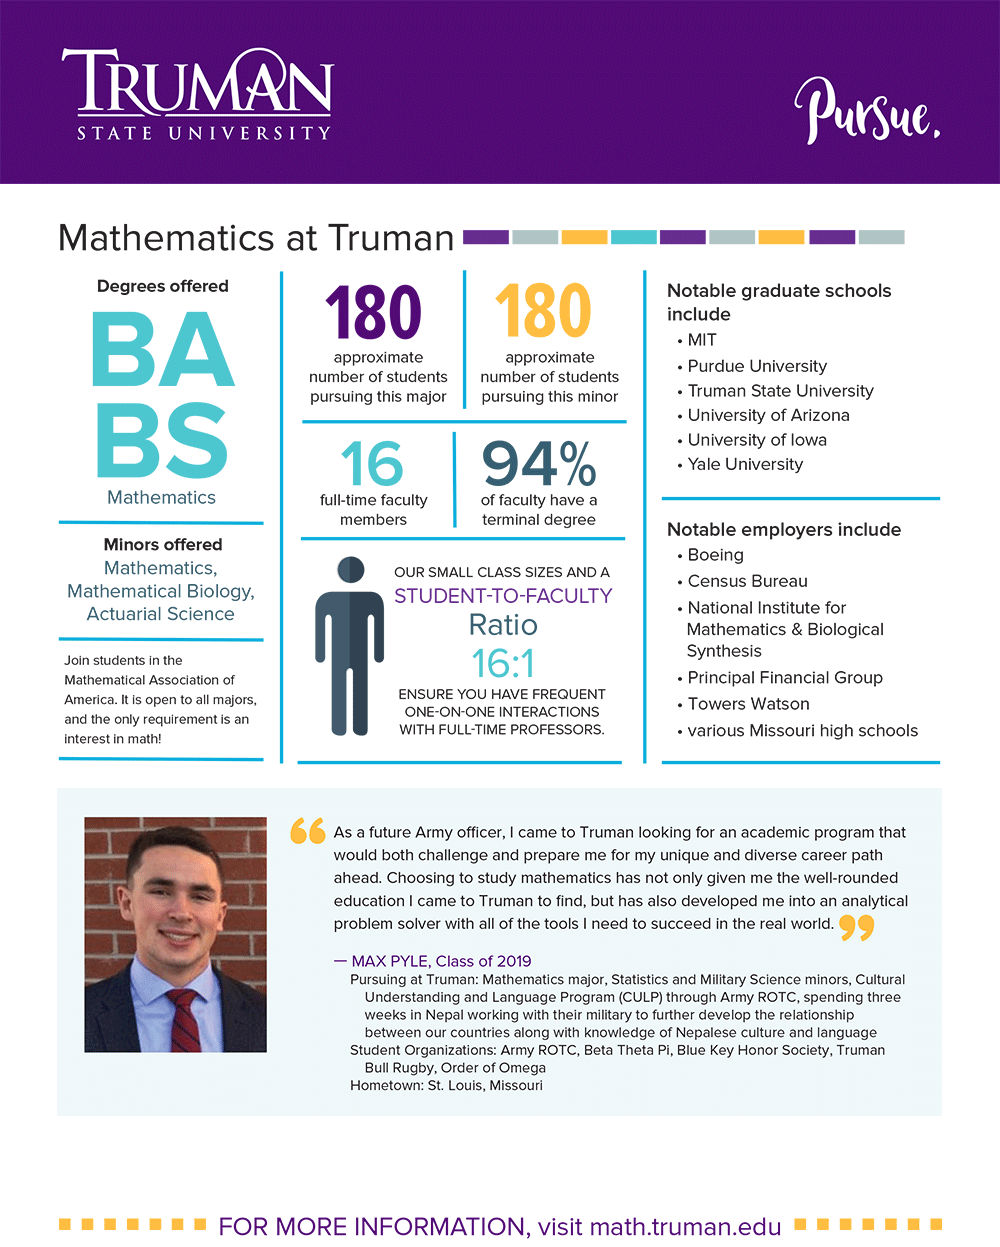 Mathematics 94